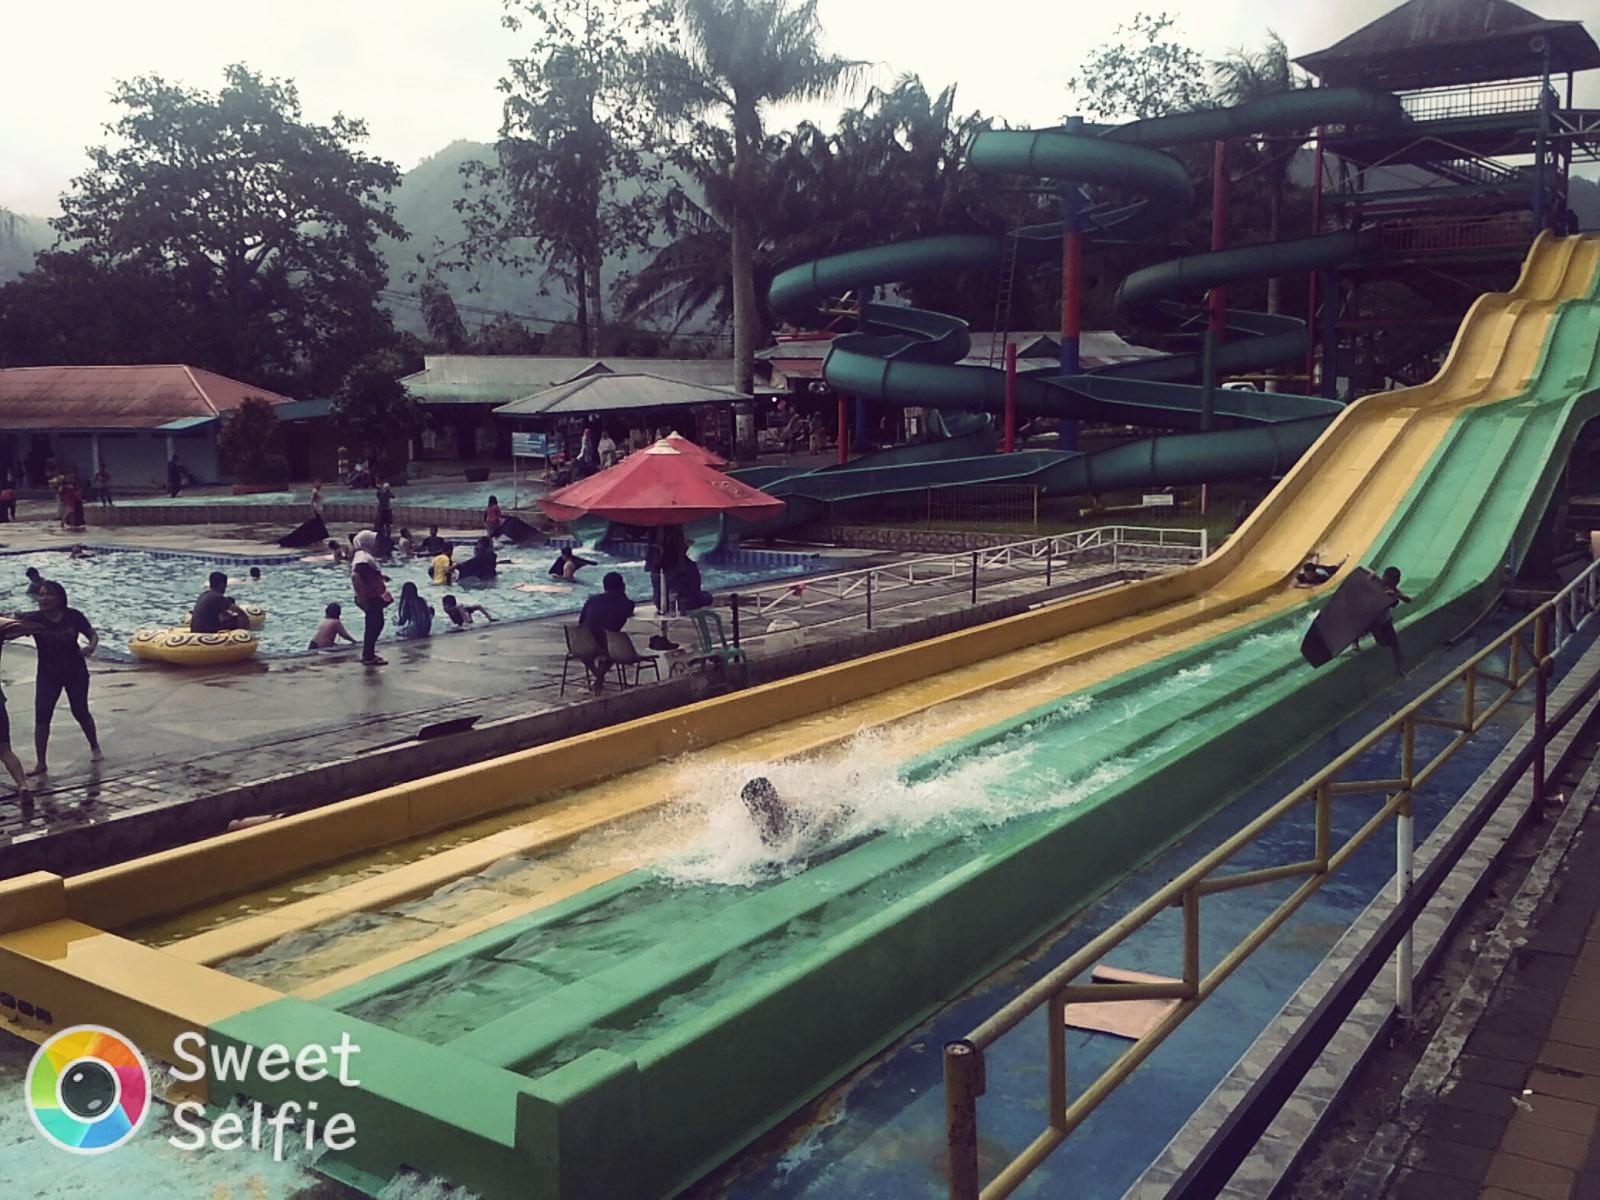 Mifan Tempat Wisata Keluarga Di Padang Panjang Nusantaranews